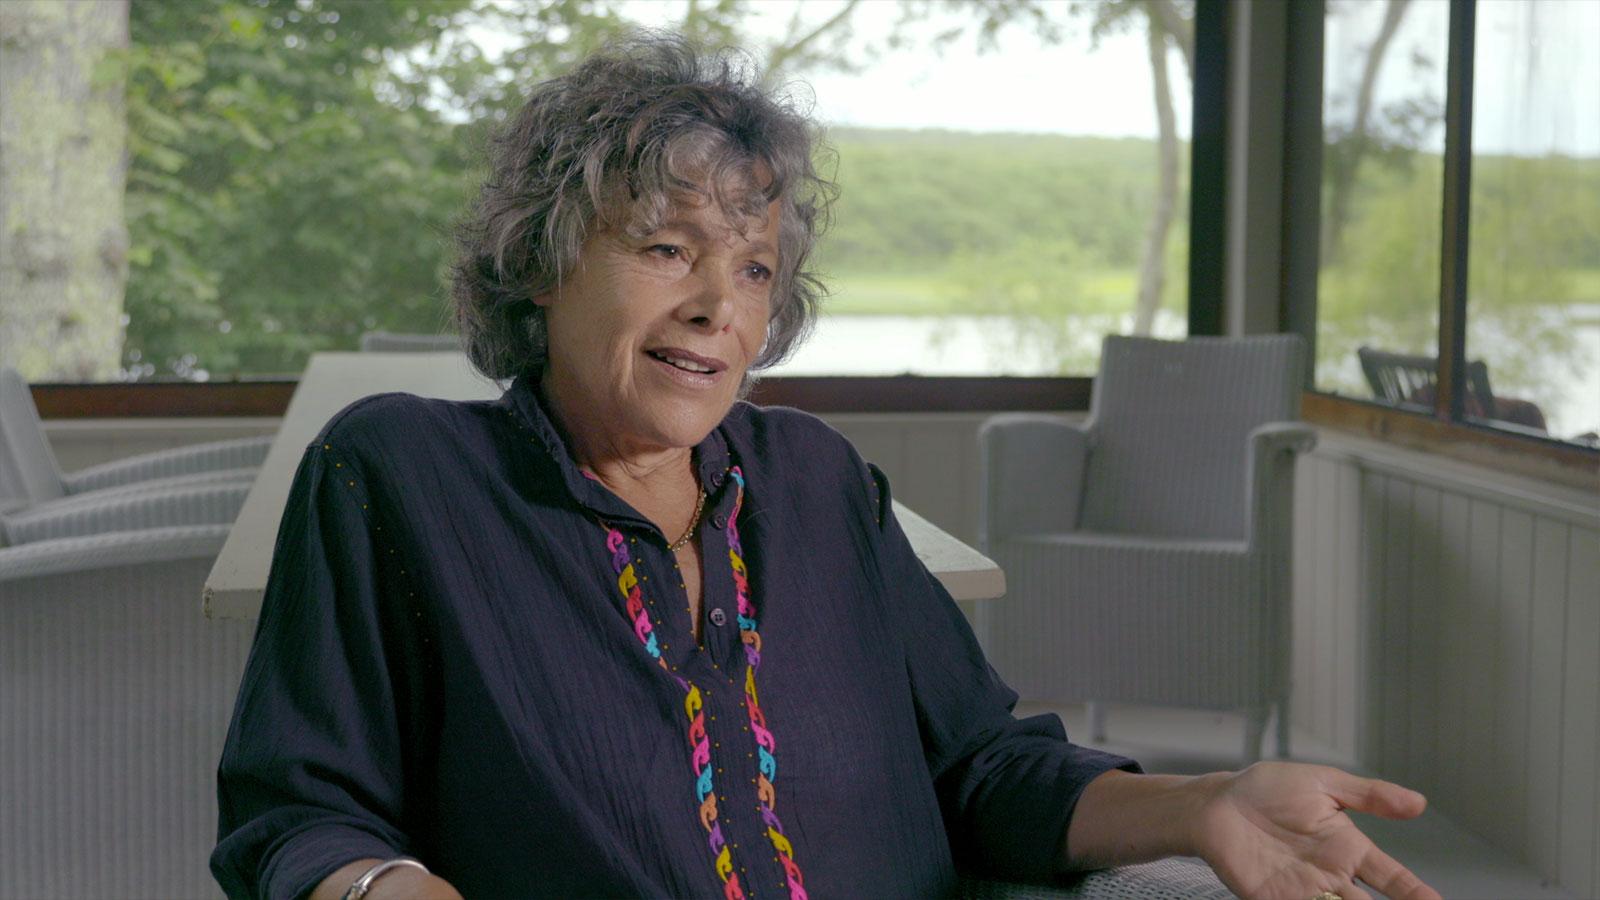 Ellen Langer Harvard professor of mindfulness